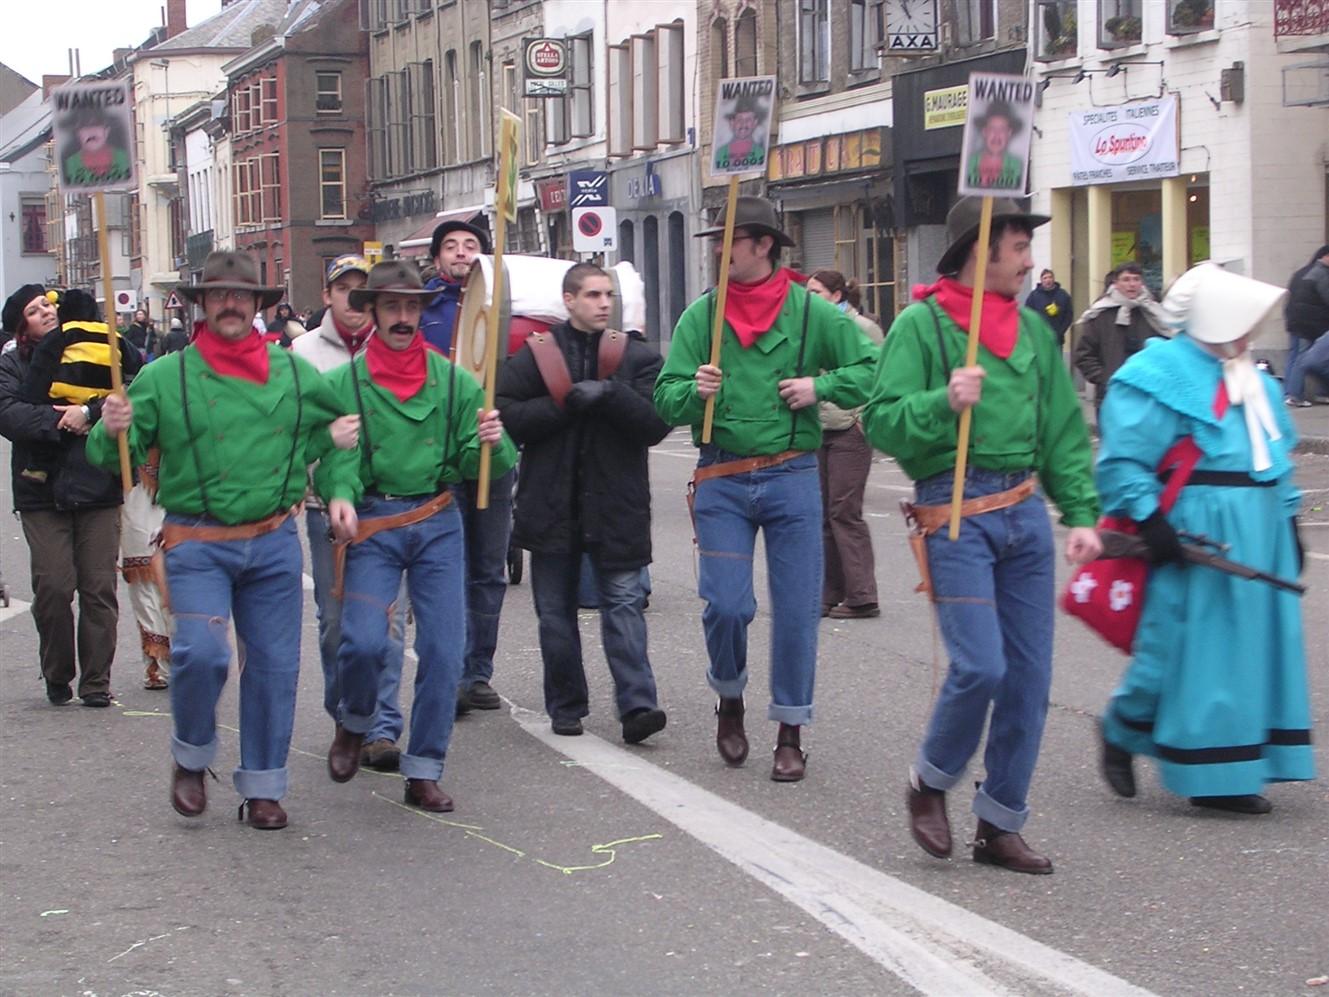 2006 02 26 Binche Belgium 31.jpg